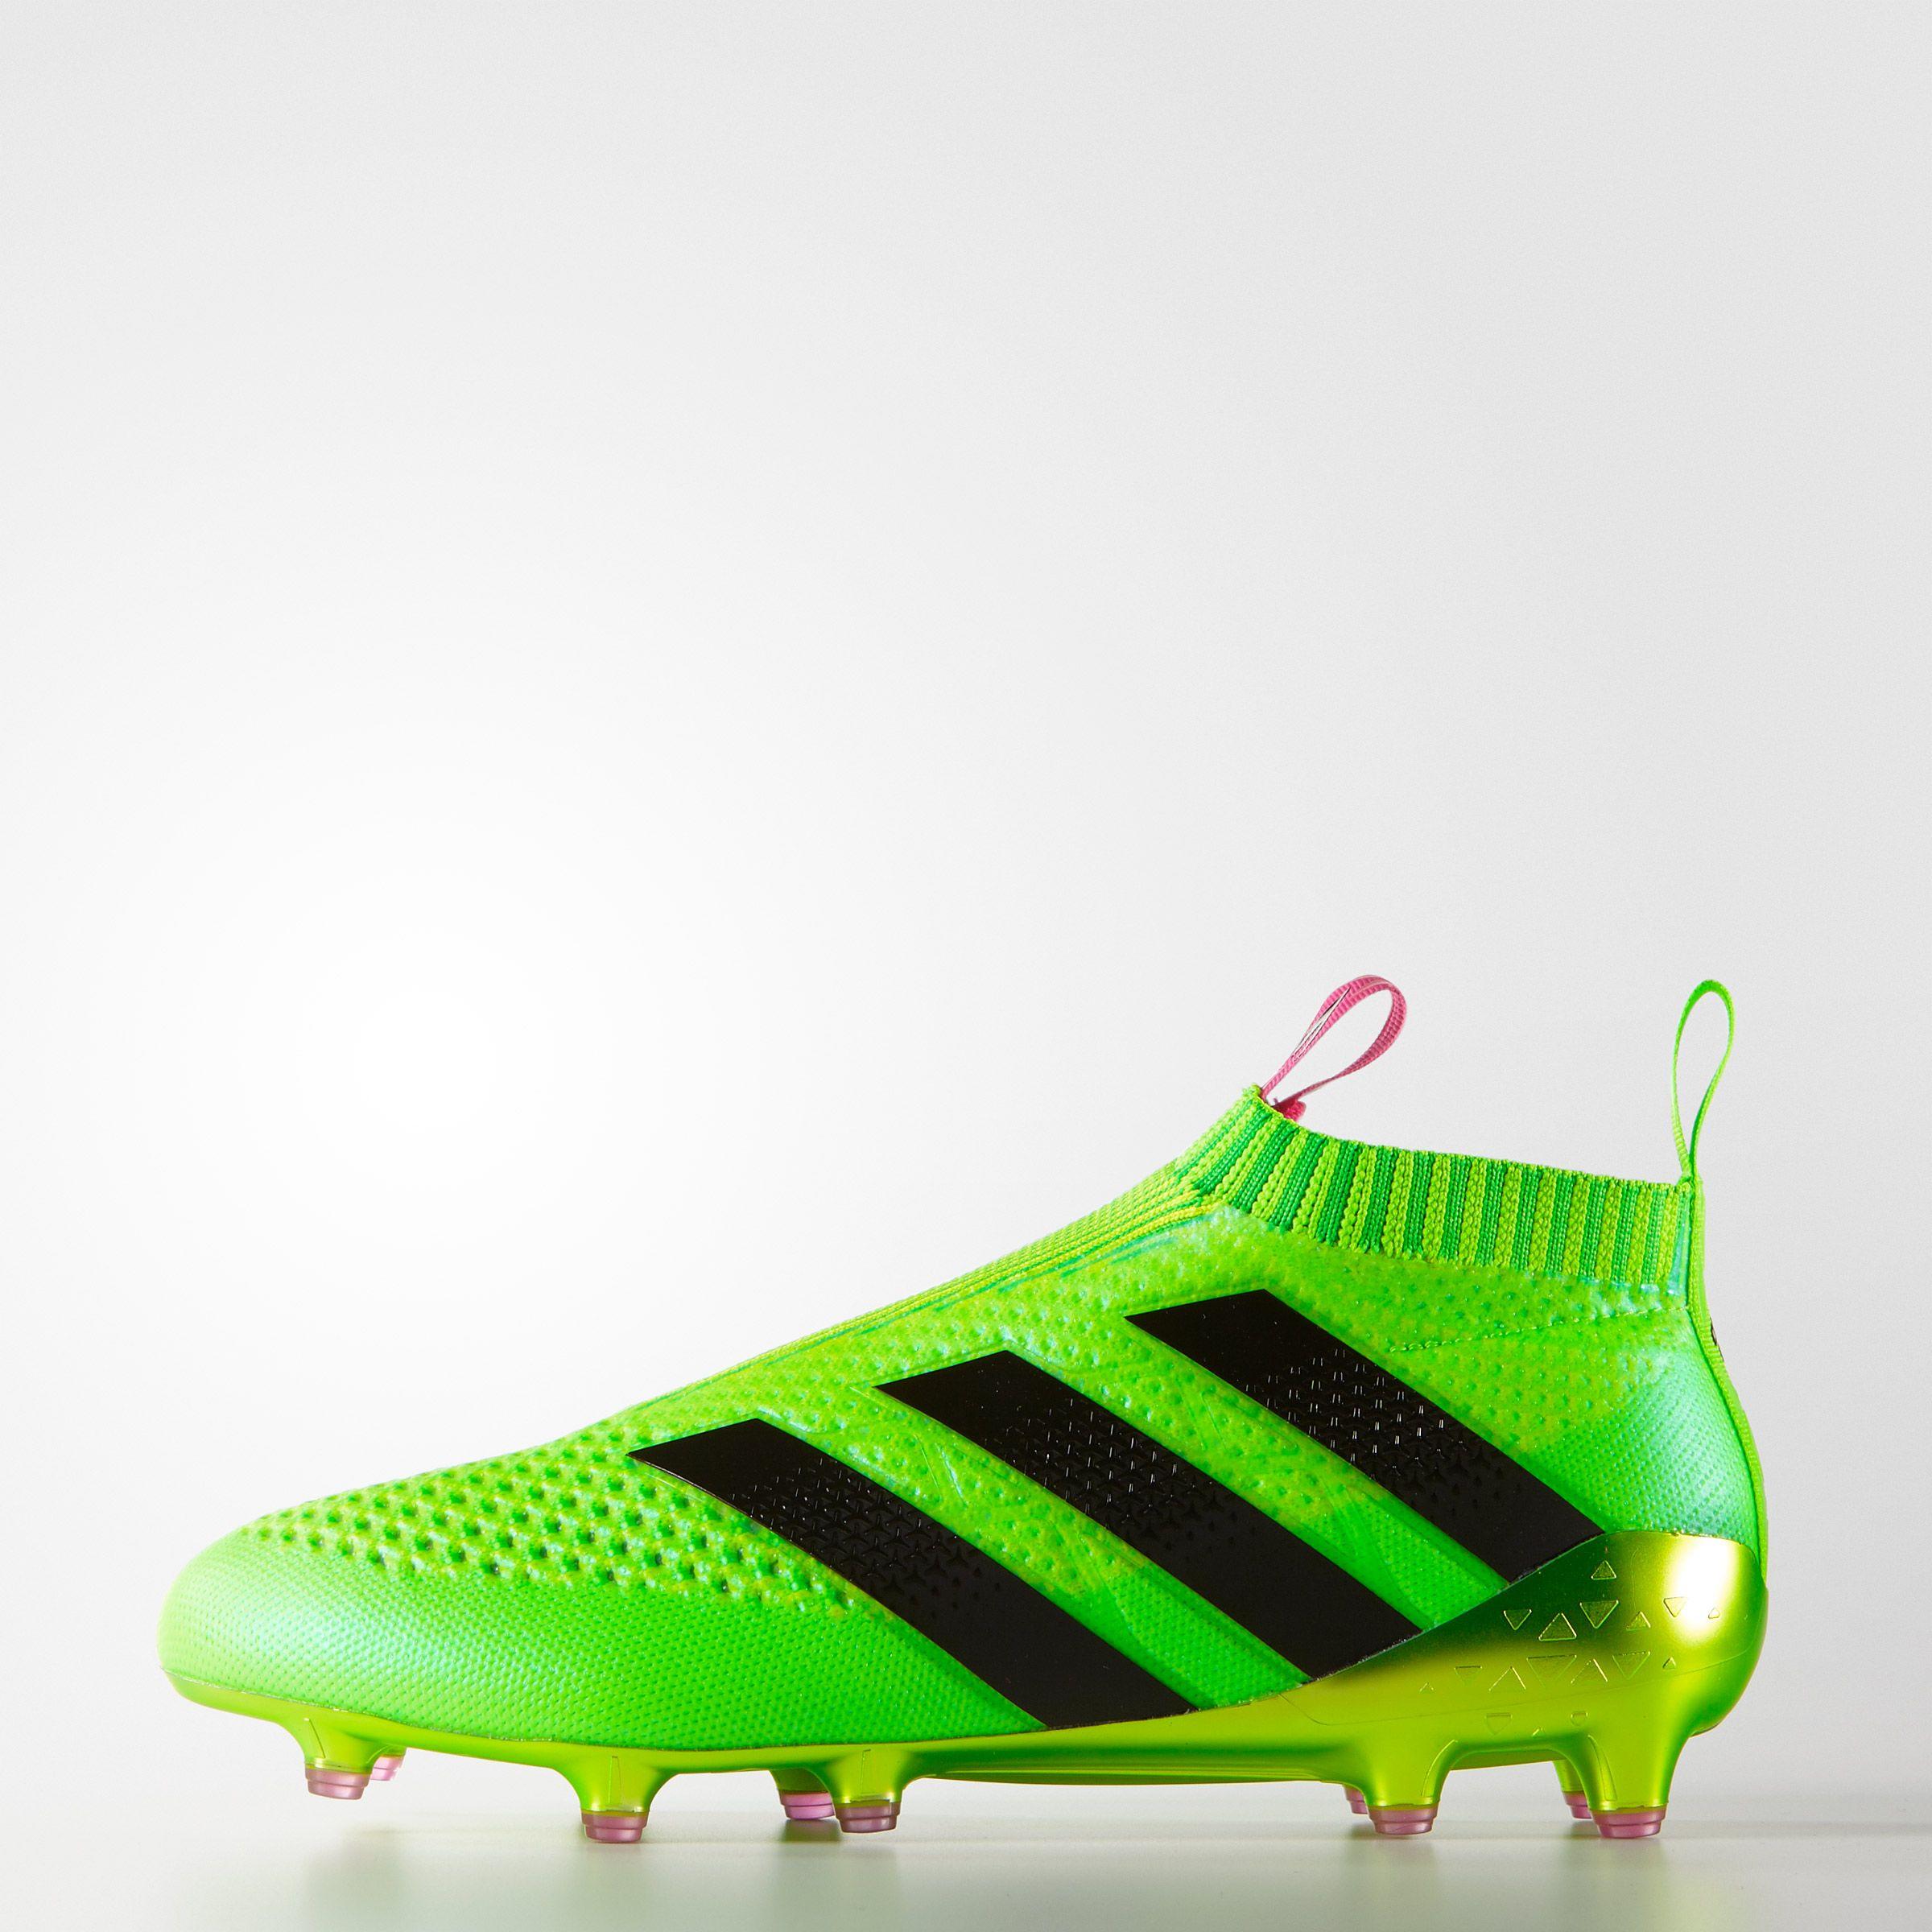 ADIDAS ACE 16+ PURECONTROL FG/AG - GREEN #9ine · Adidas CleatsAdidas  FootballFootball BootsAdidas MenAdidas ...